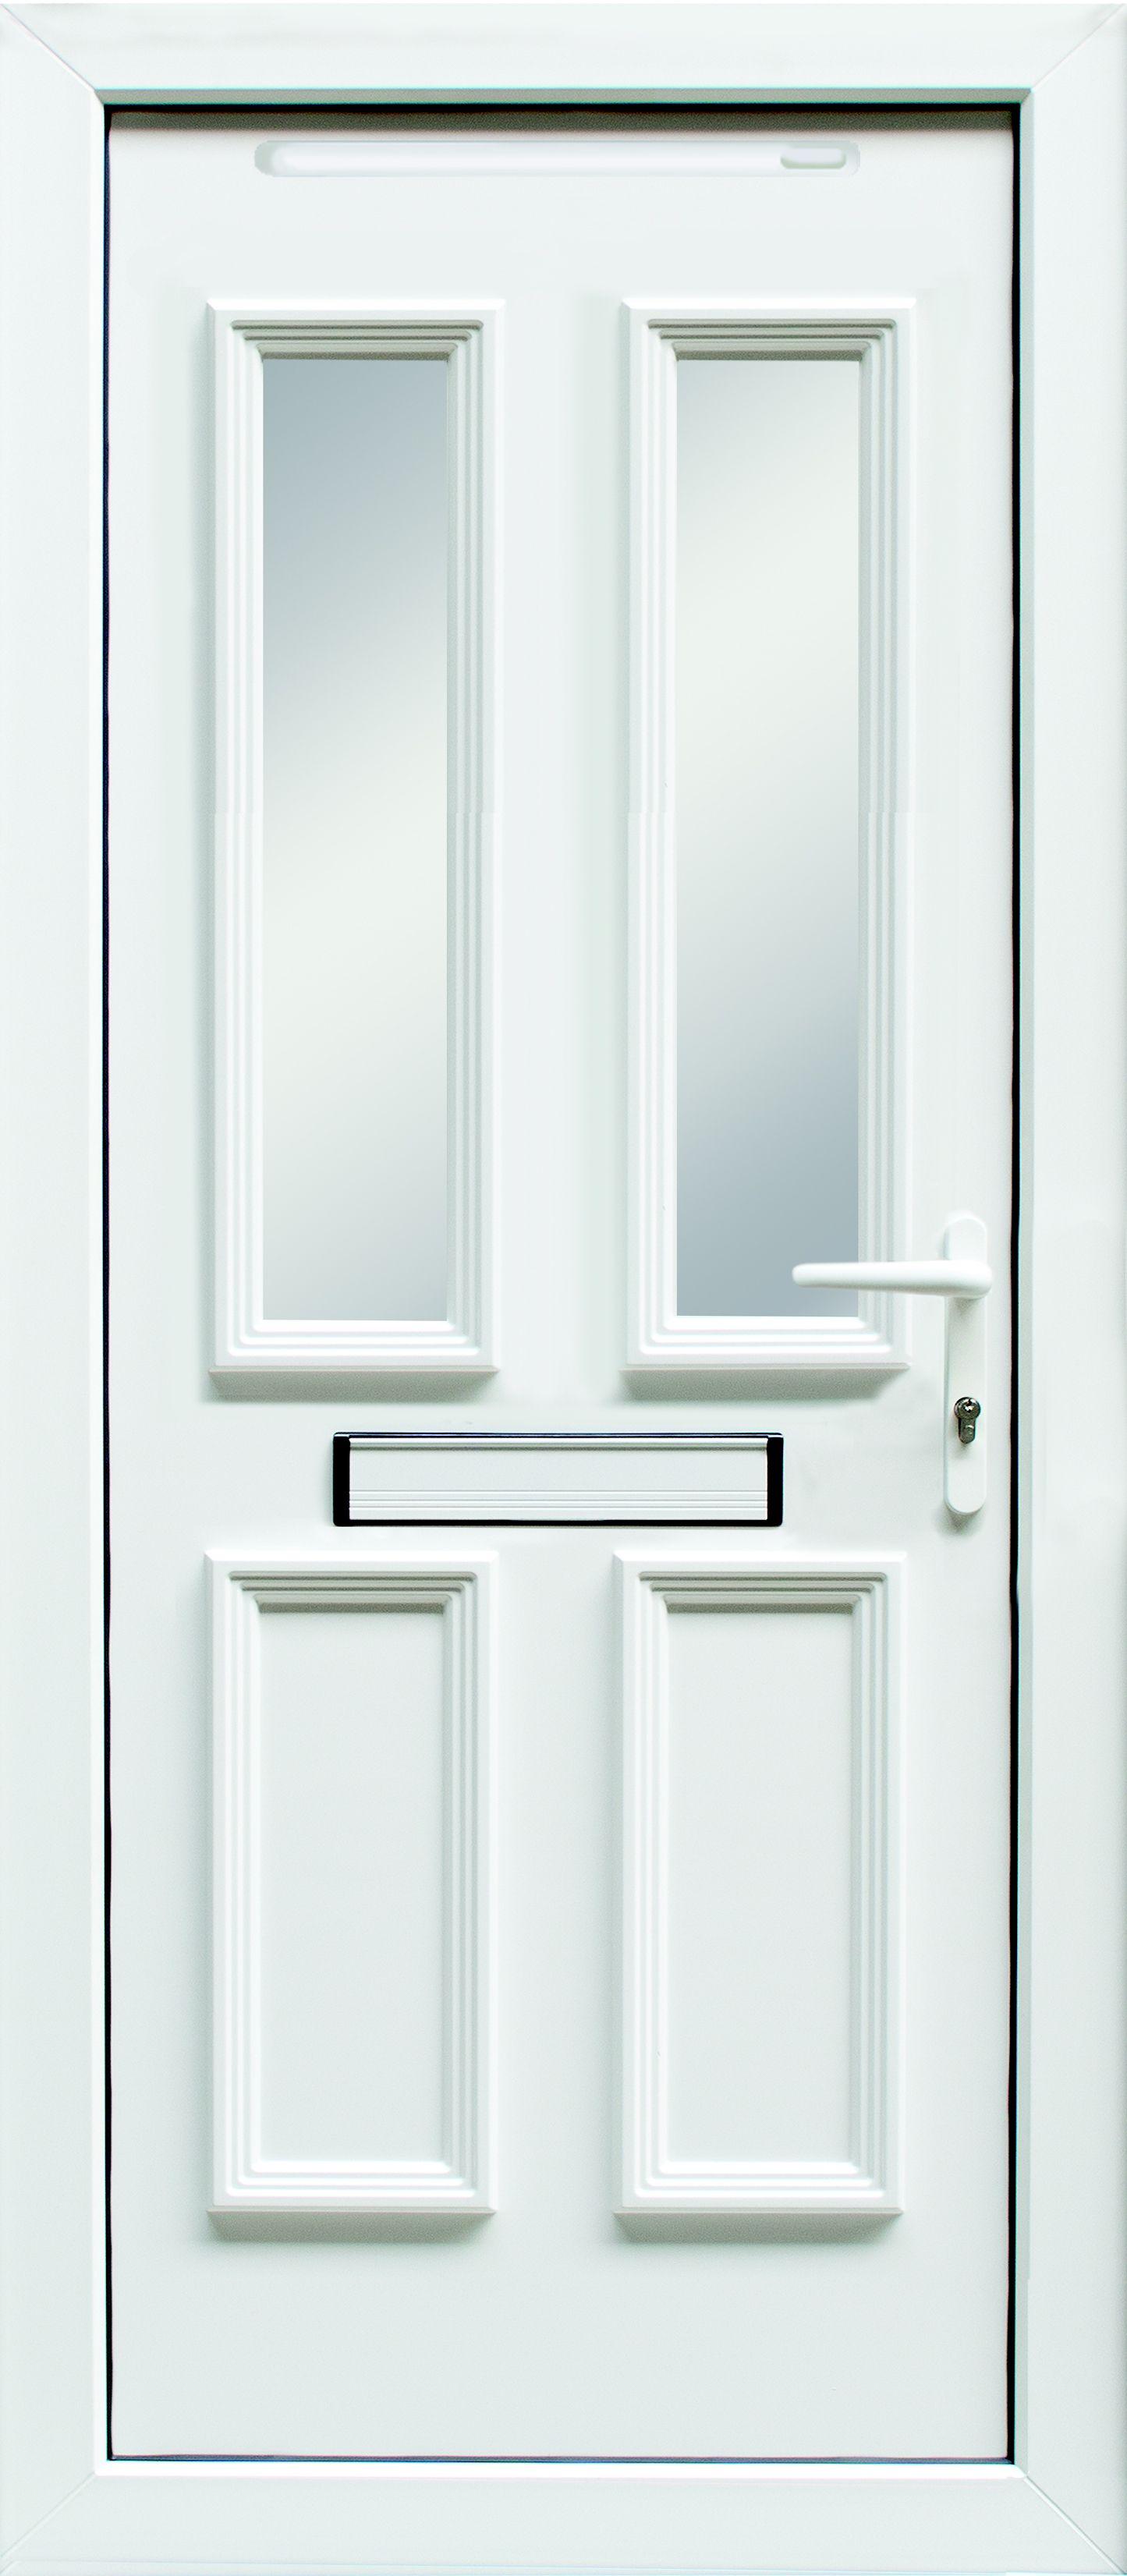 4 Panel Pvcu Glazed External Front Door U0026 Frame Lh, (h)2055mm (